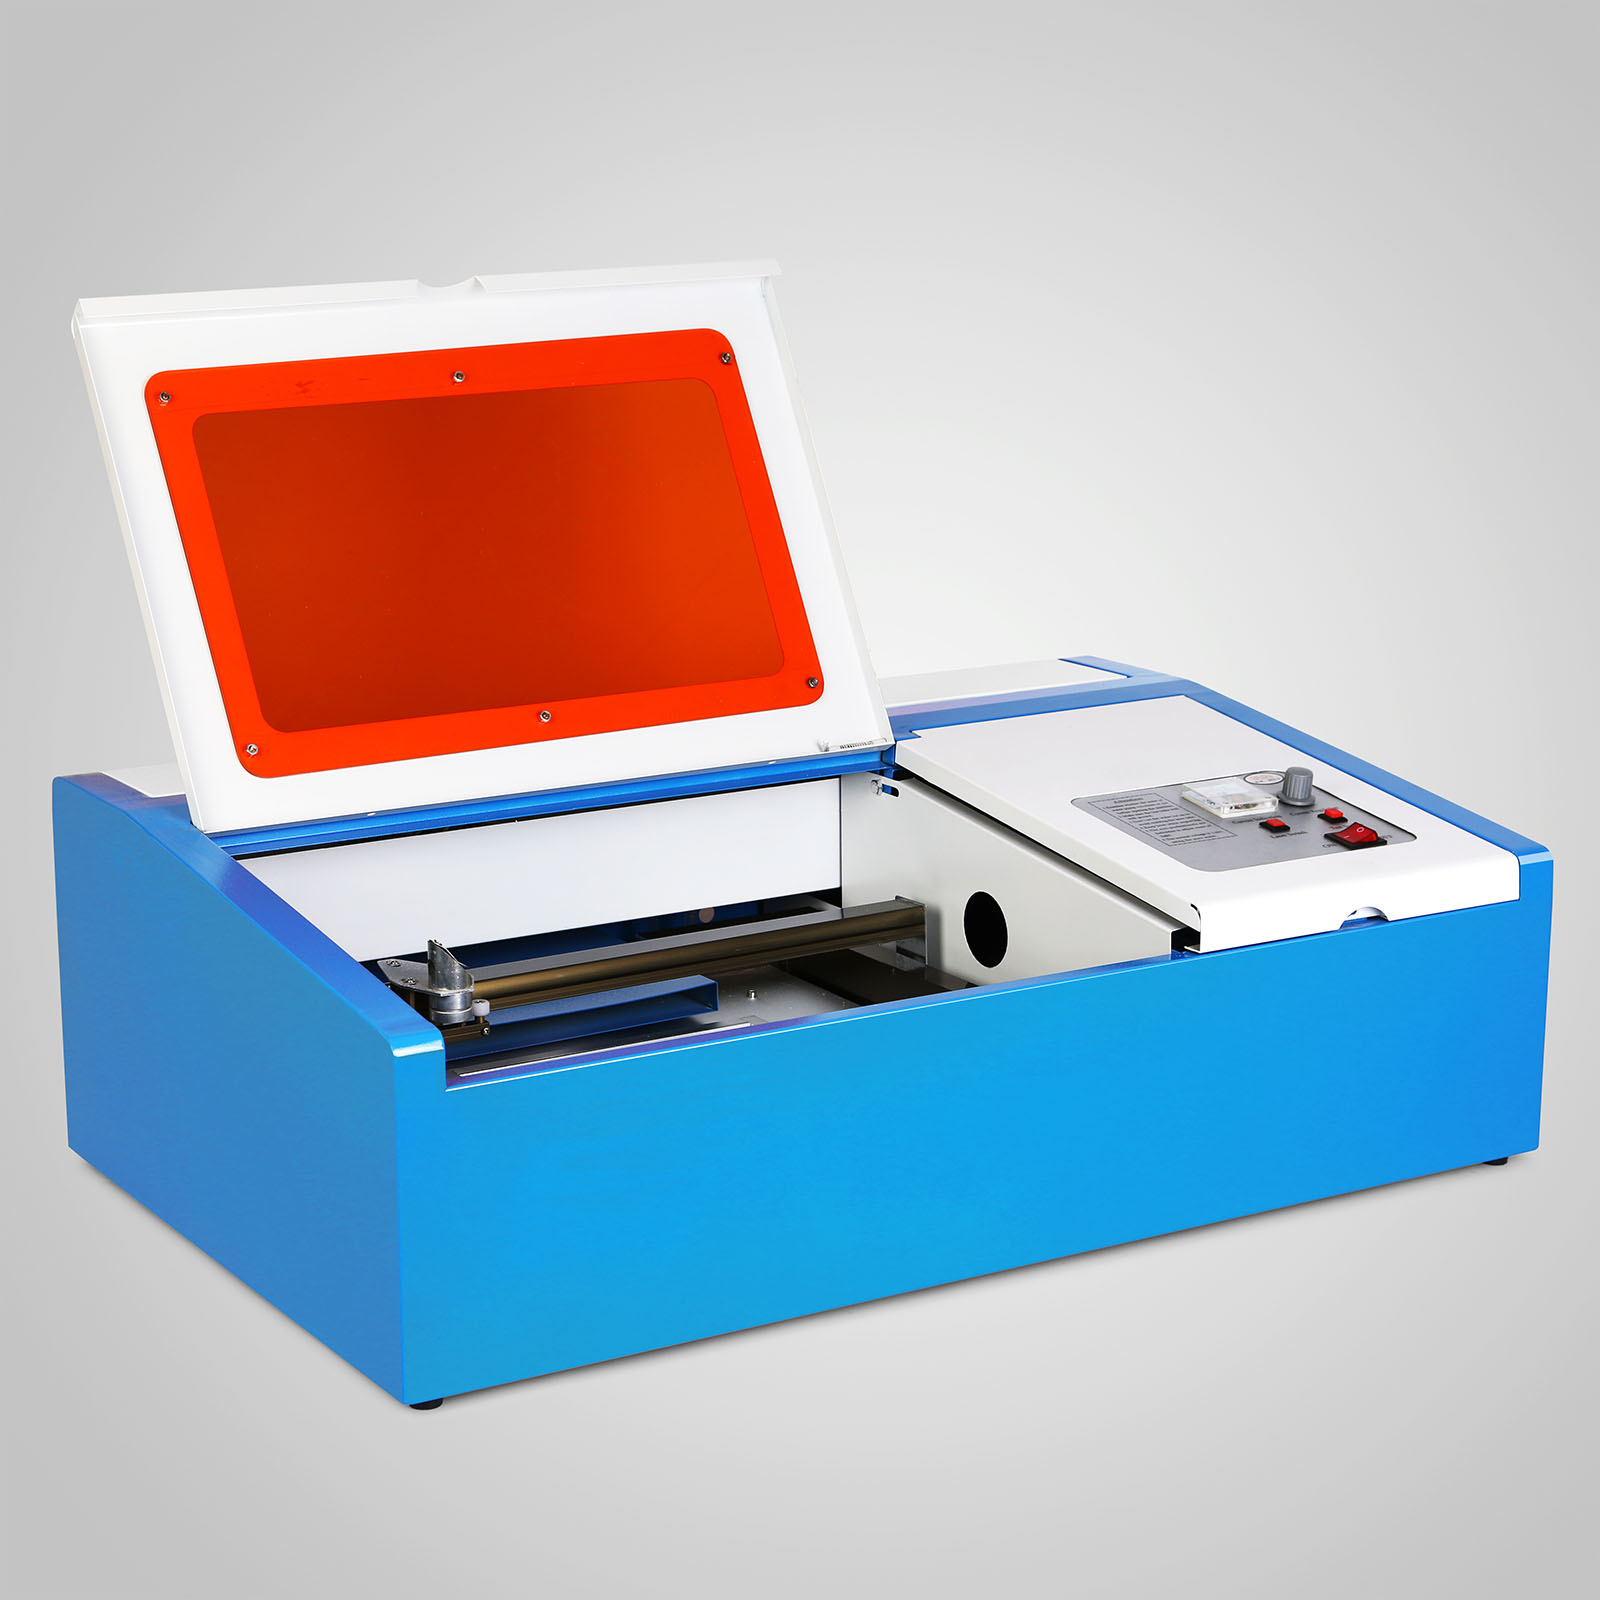 Macchina-per-Incisione-Laser-CO2-40-130W-Asse-Rotante-Tagliatrice-Incisore miniatura 19